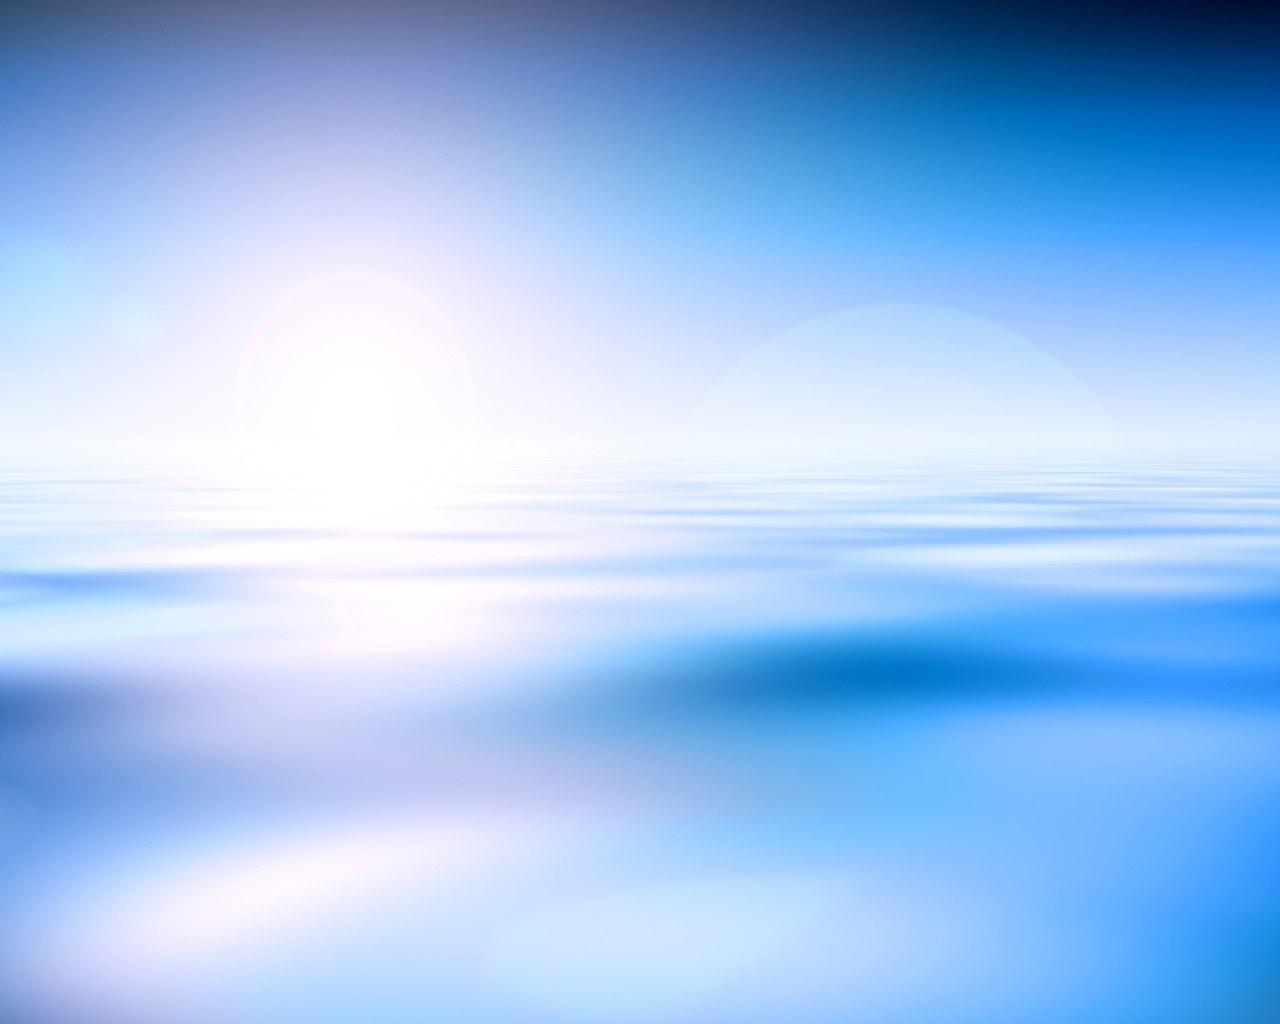 light blue backgrounds hd wallpapers 1280x1024